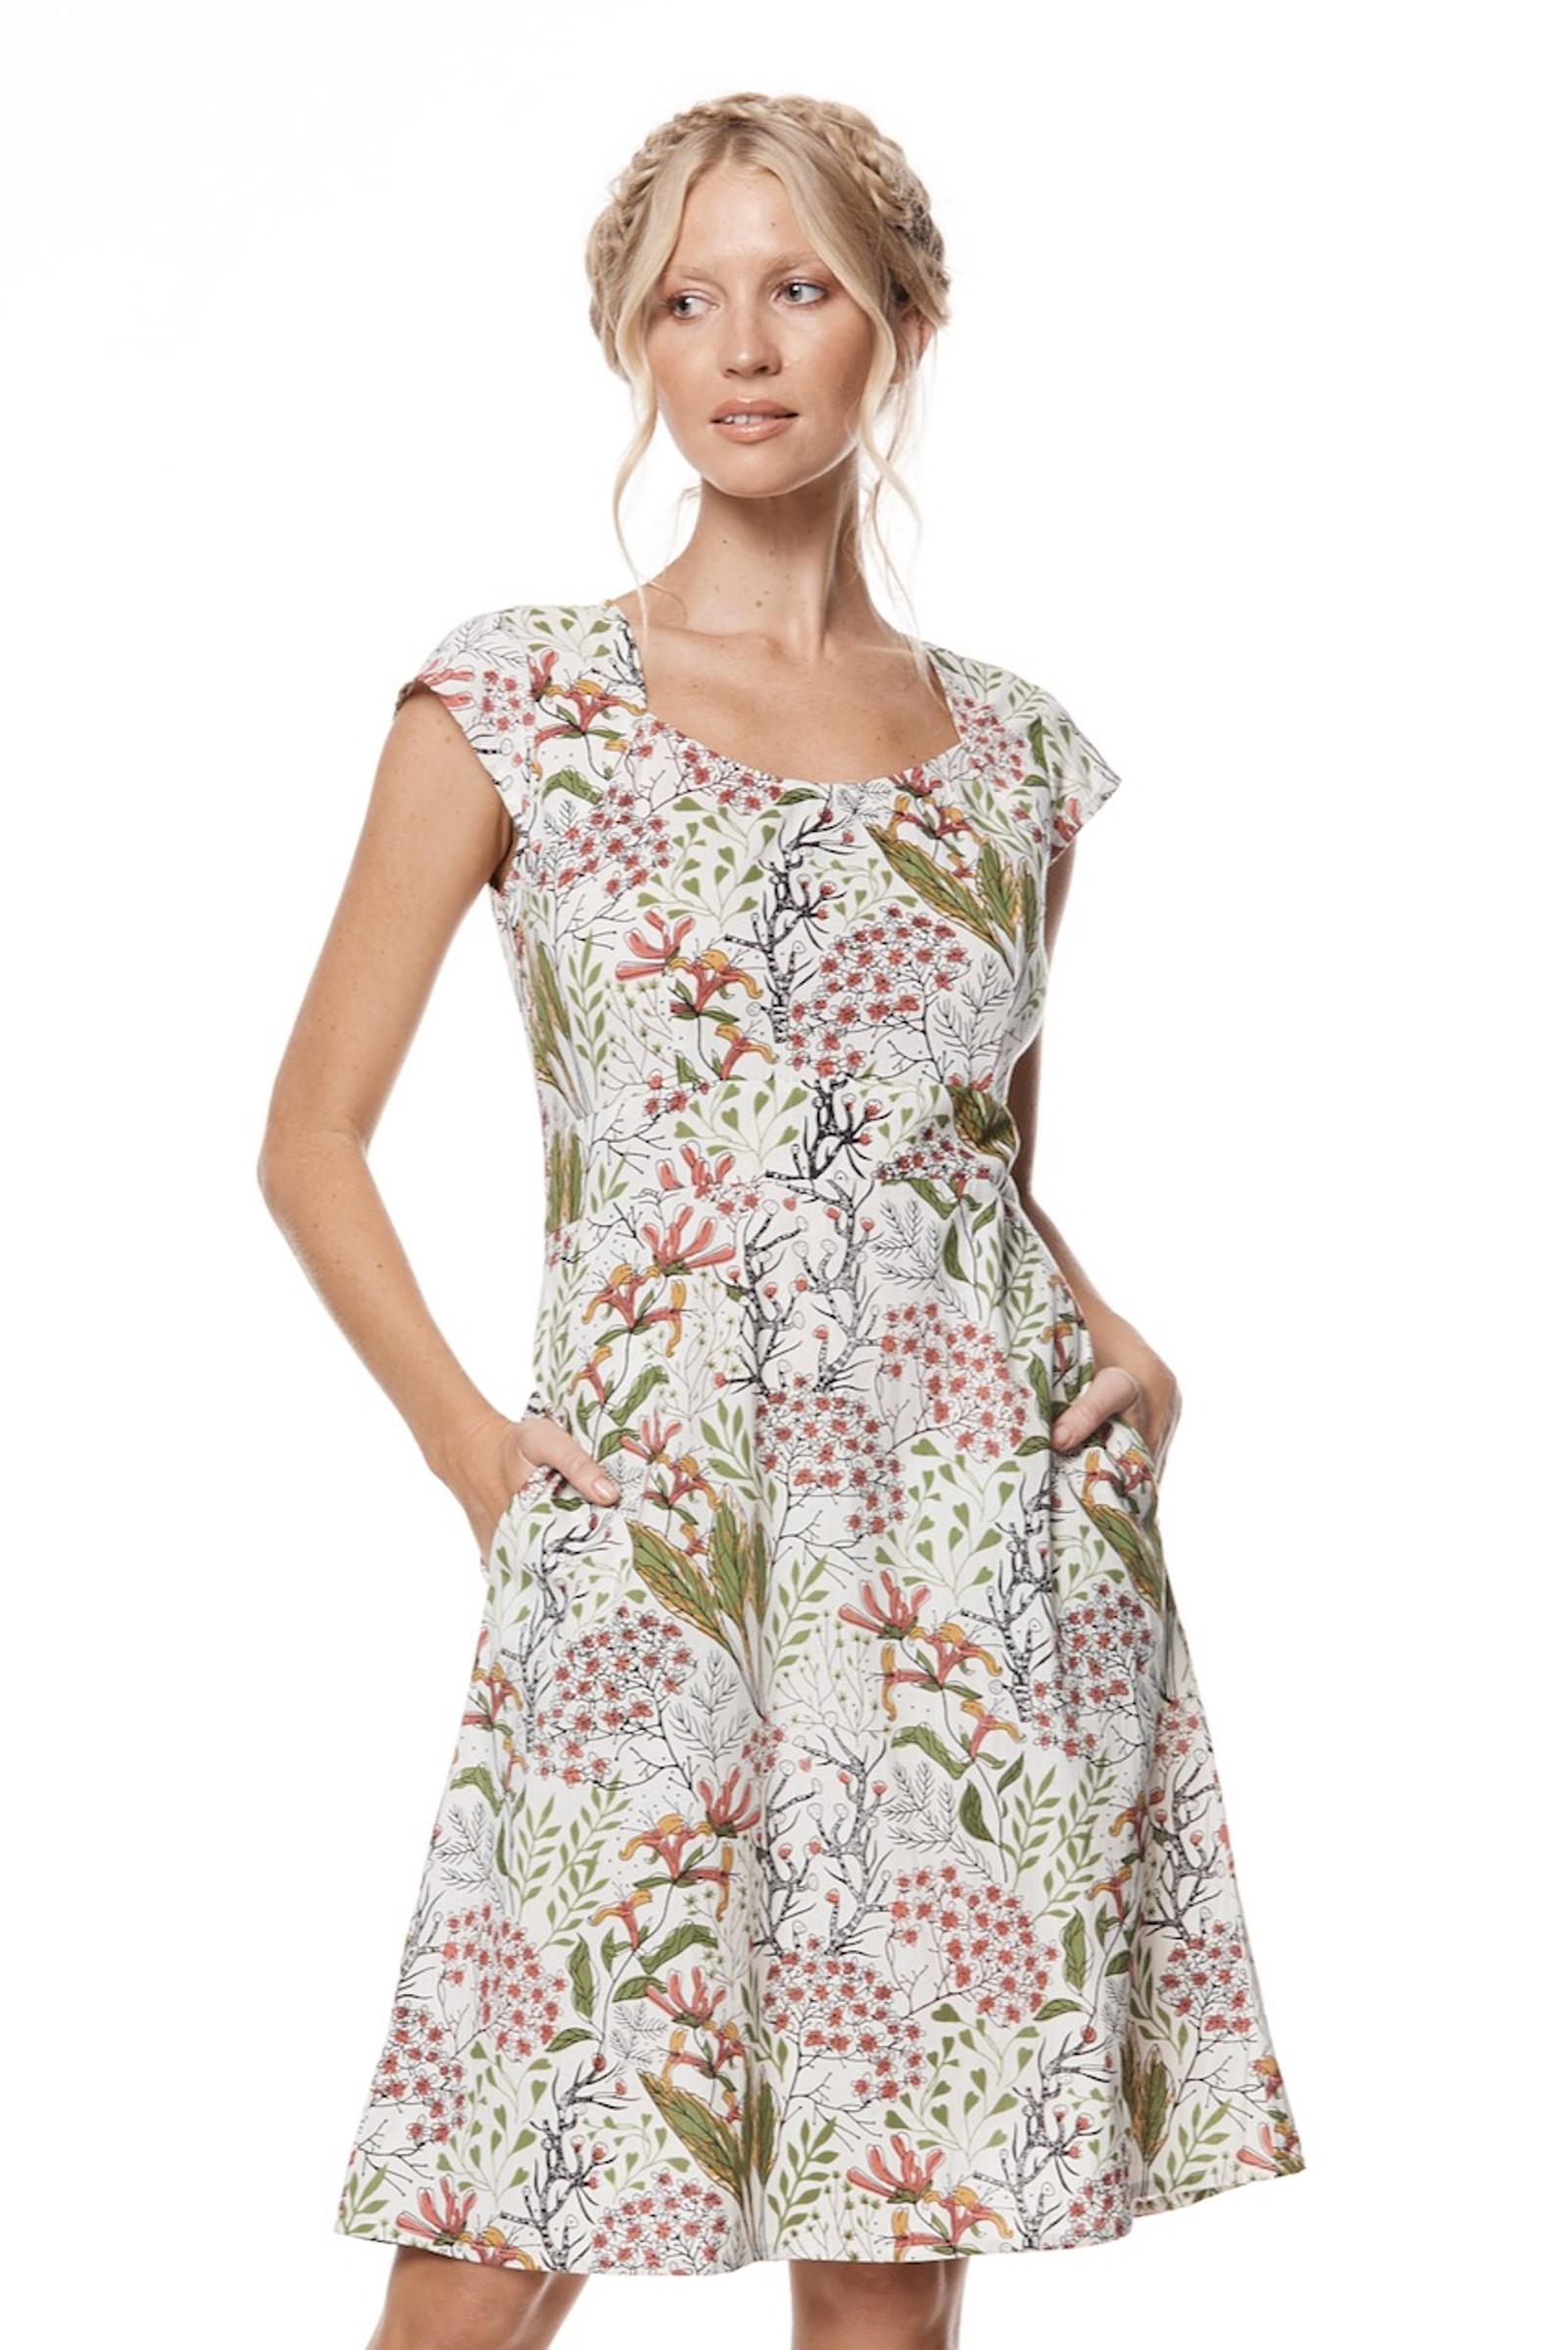 Elsy Dress - Freesia